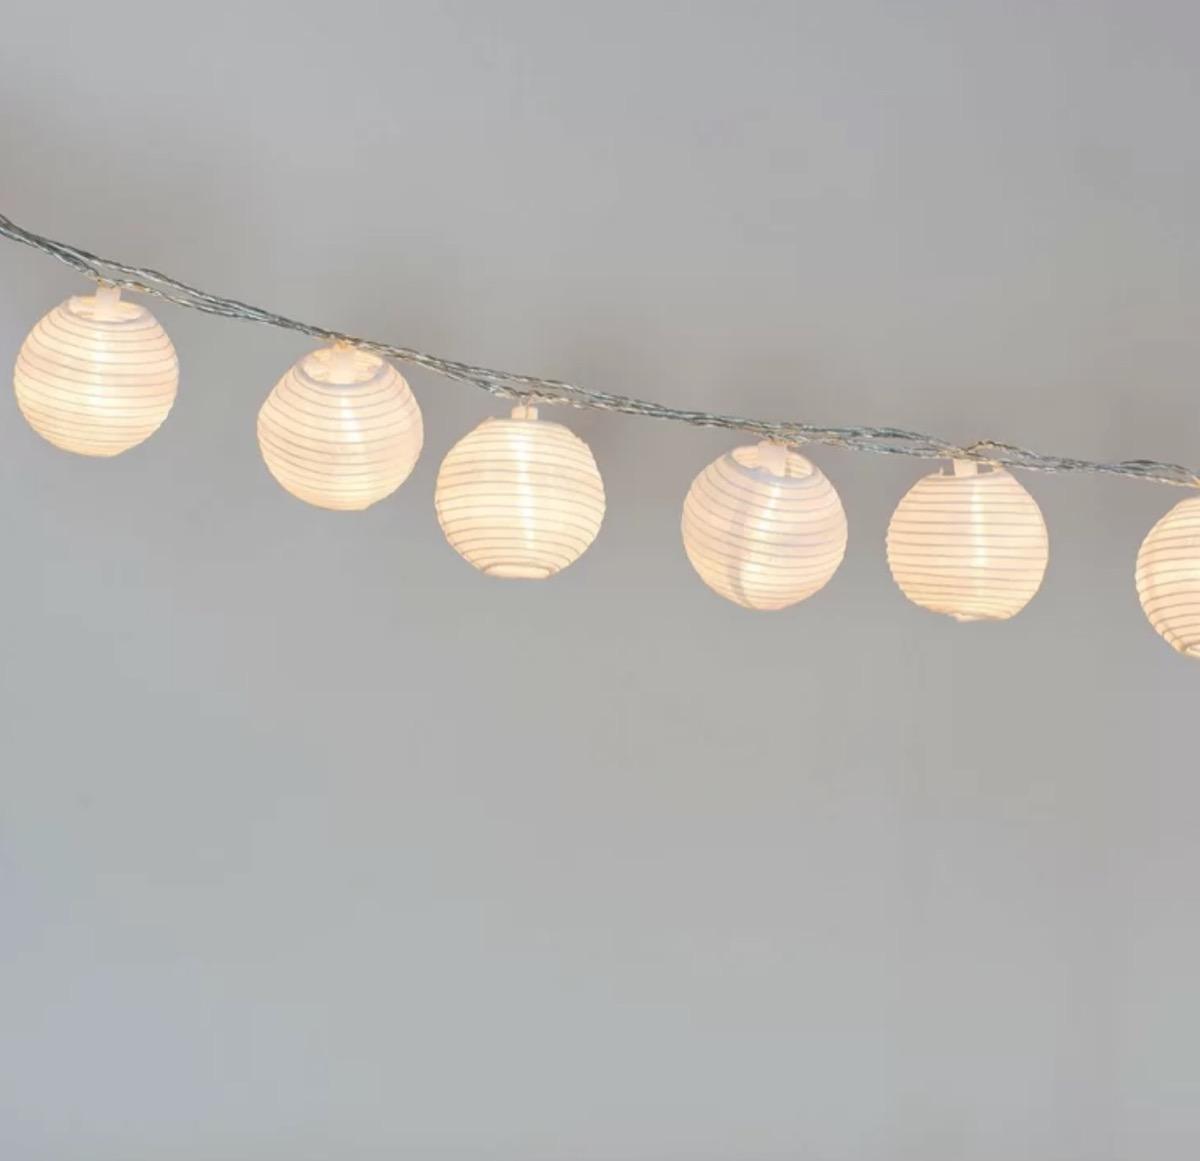 solar LED rice lantern string lights, summer party essentials